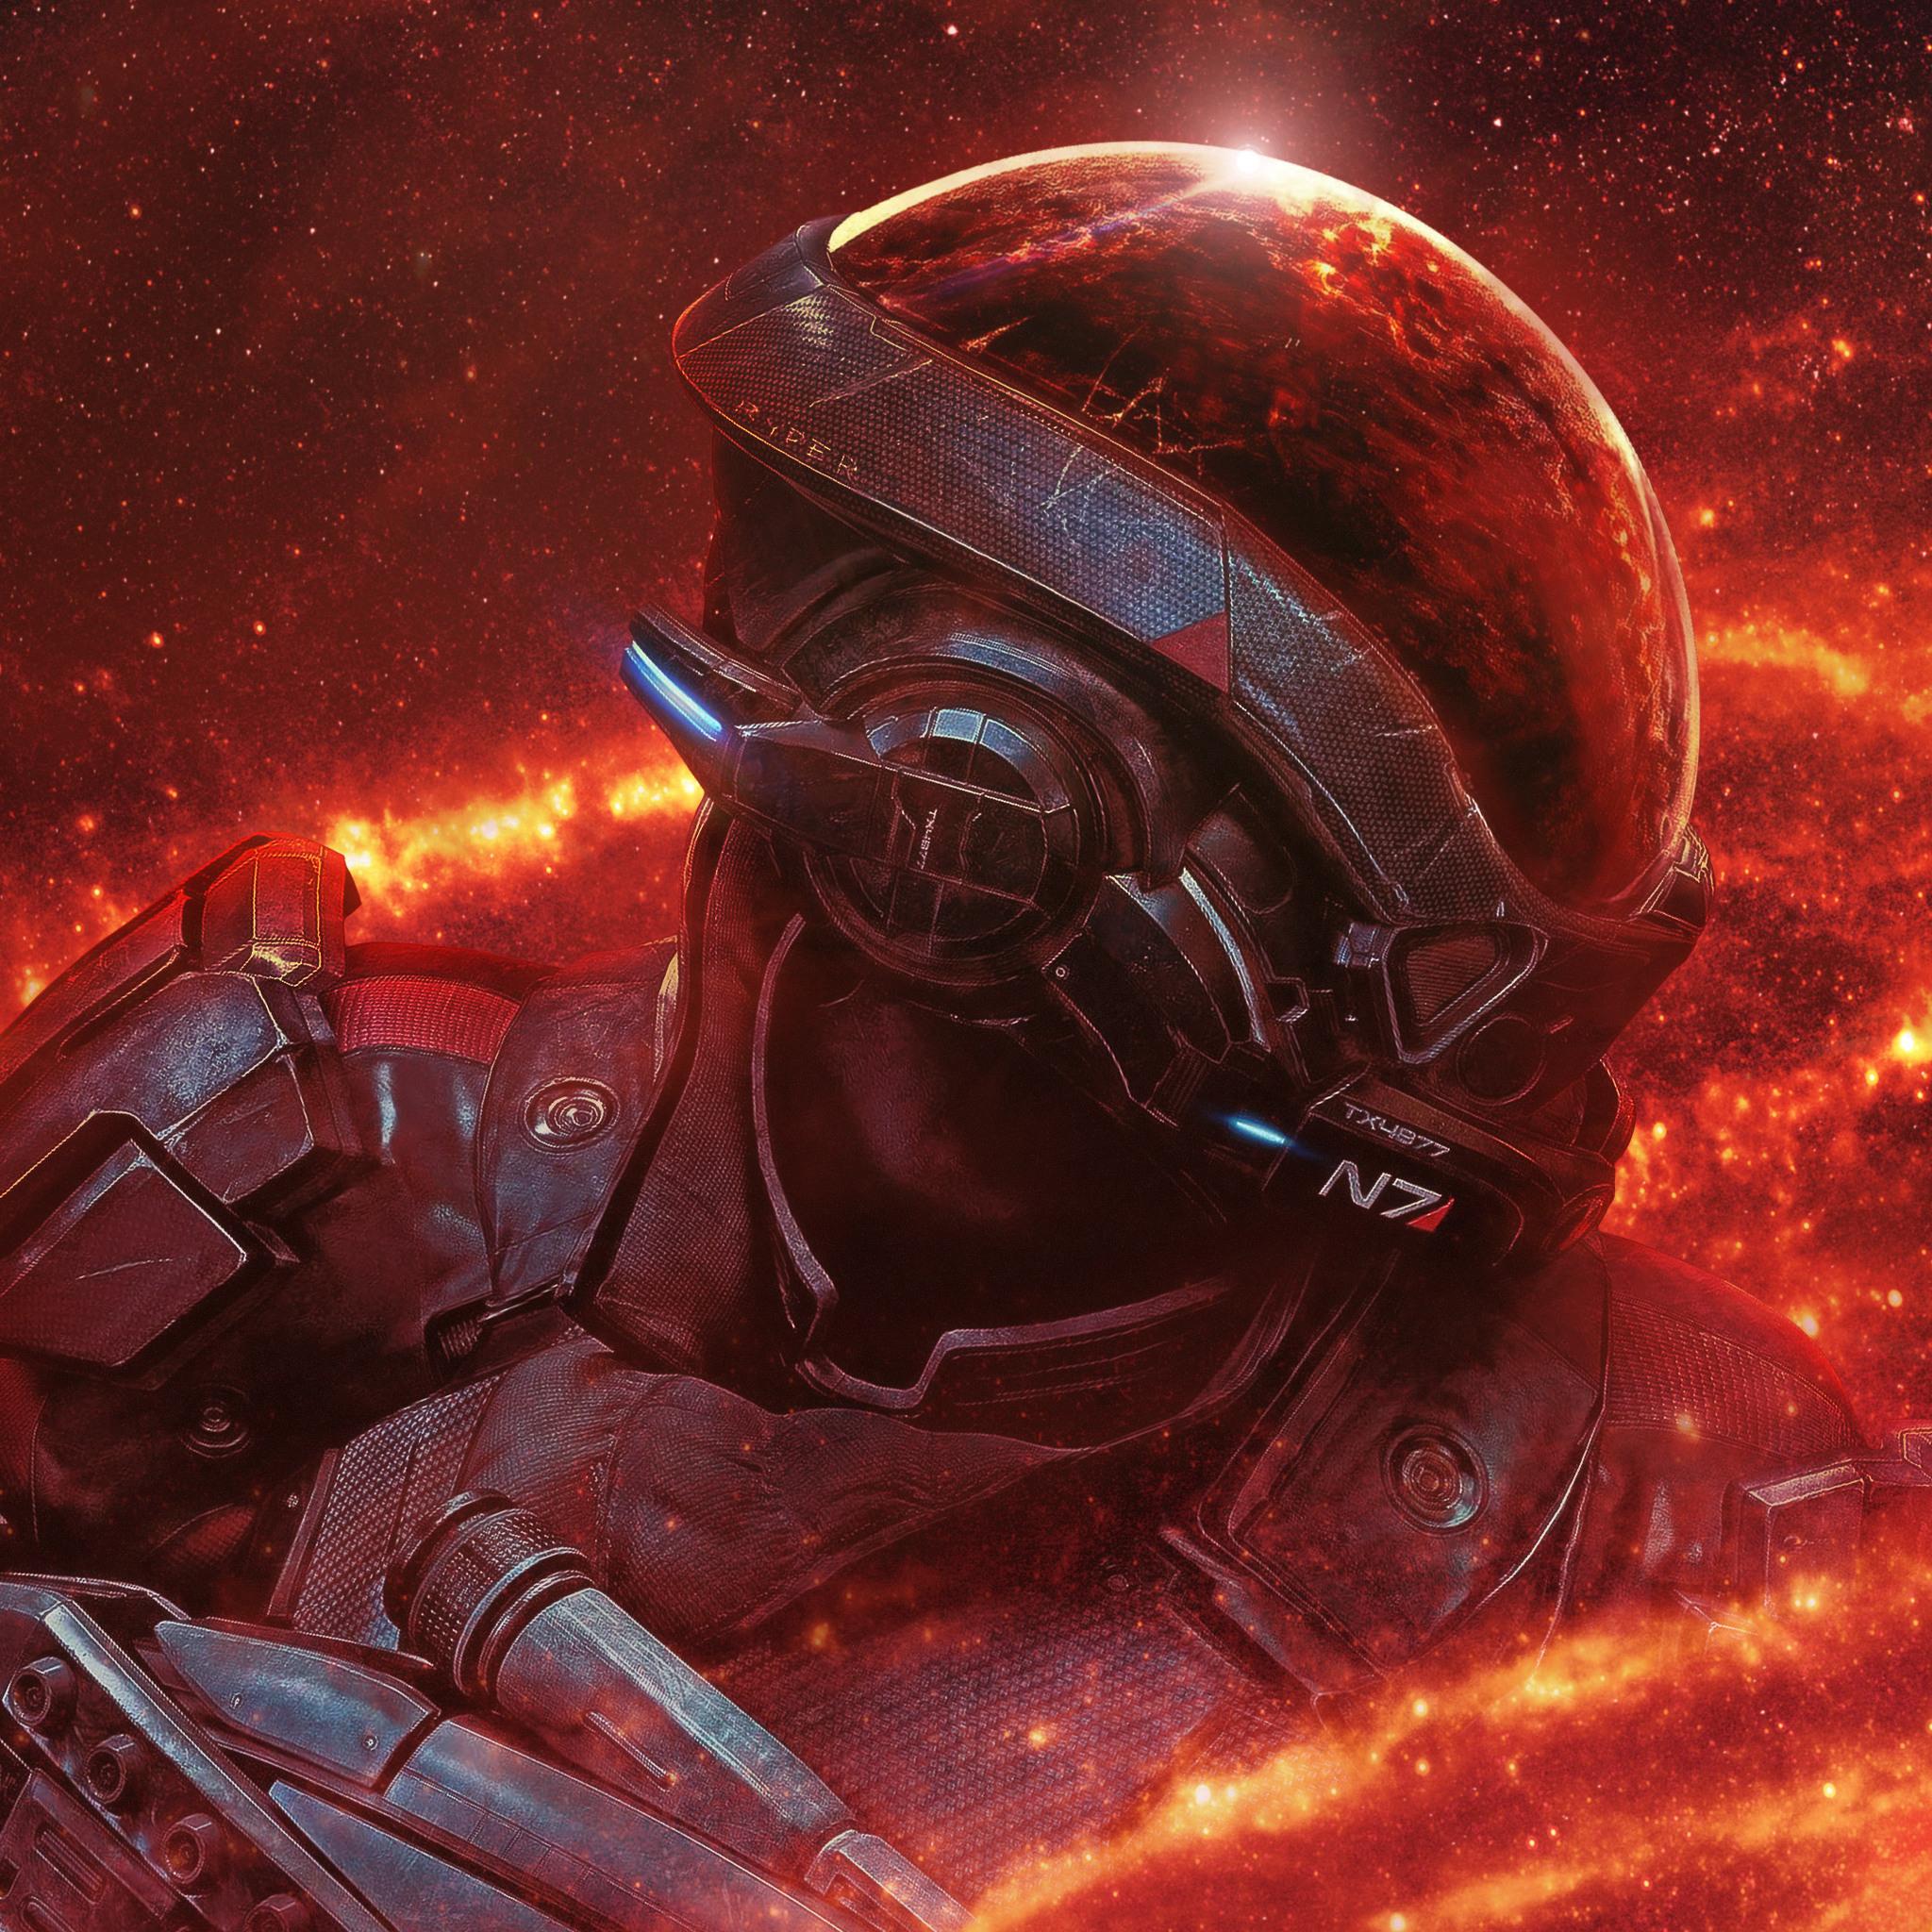 2048x2048 Mass Effect Andromeda RYDER N7 4k Ipad Air HD 4k ...